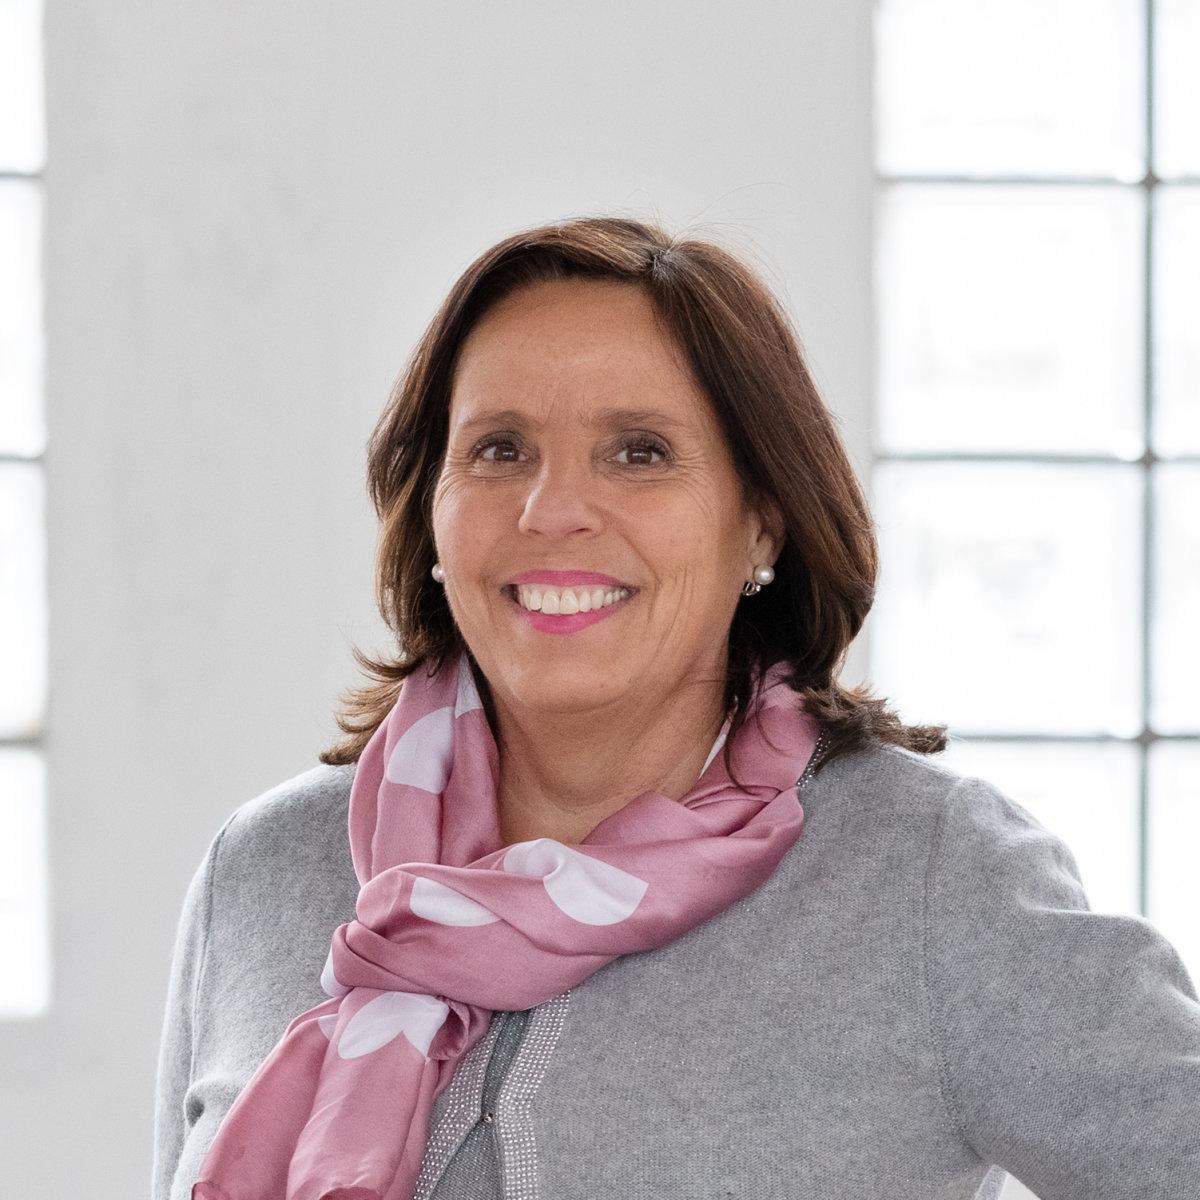 Elisabeth Pfeifer